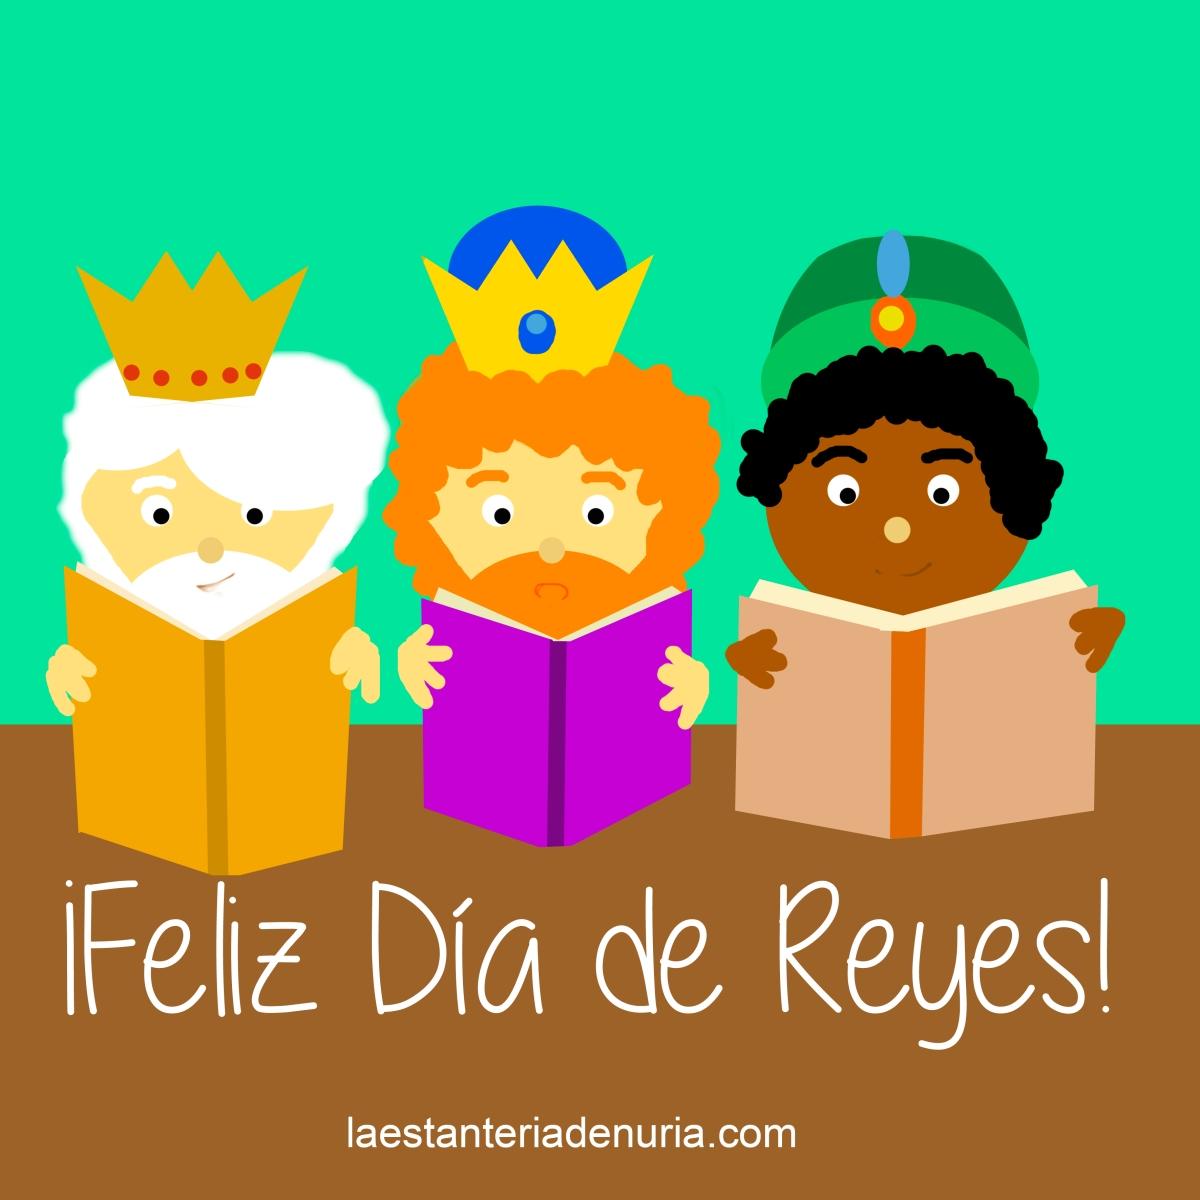 ¡Feliz día de Reyes!.jpg